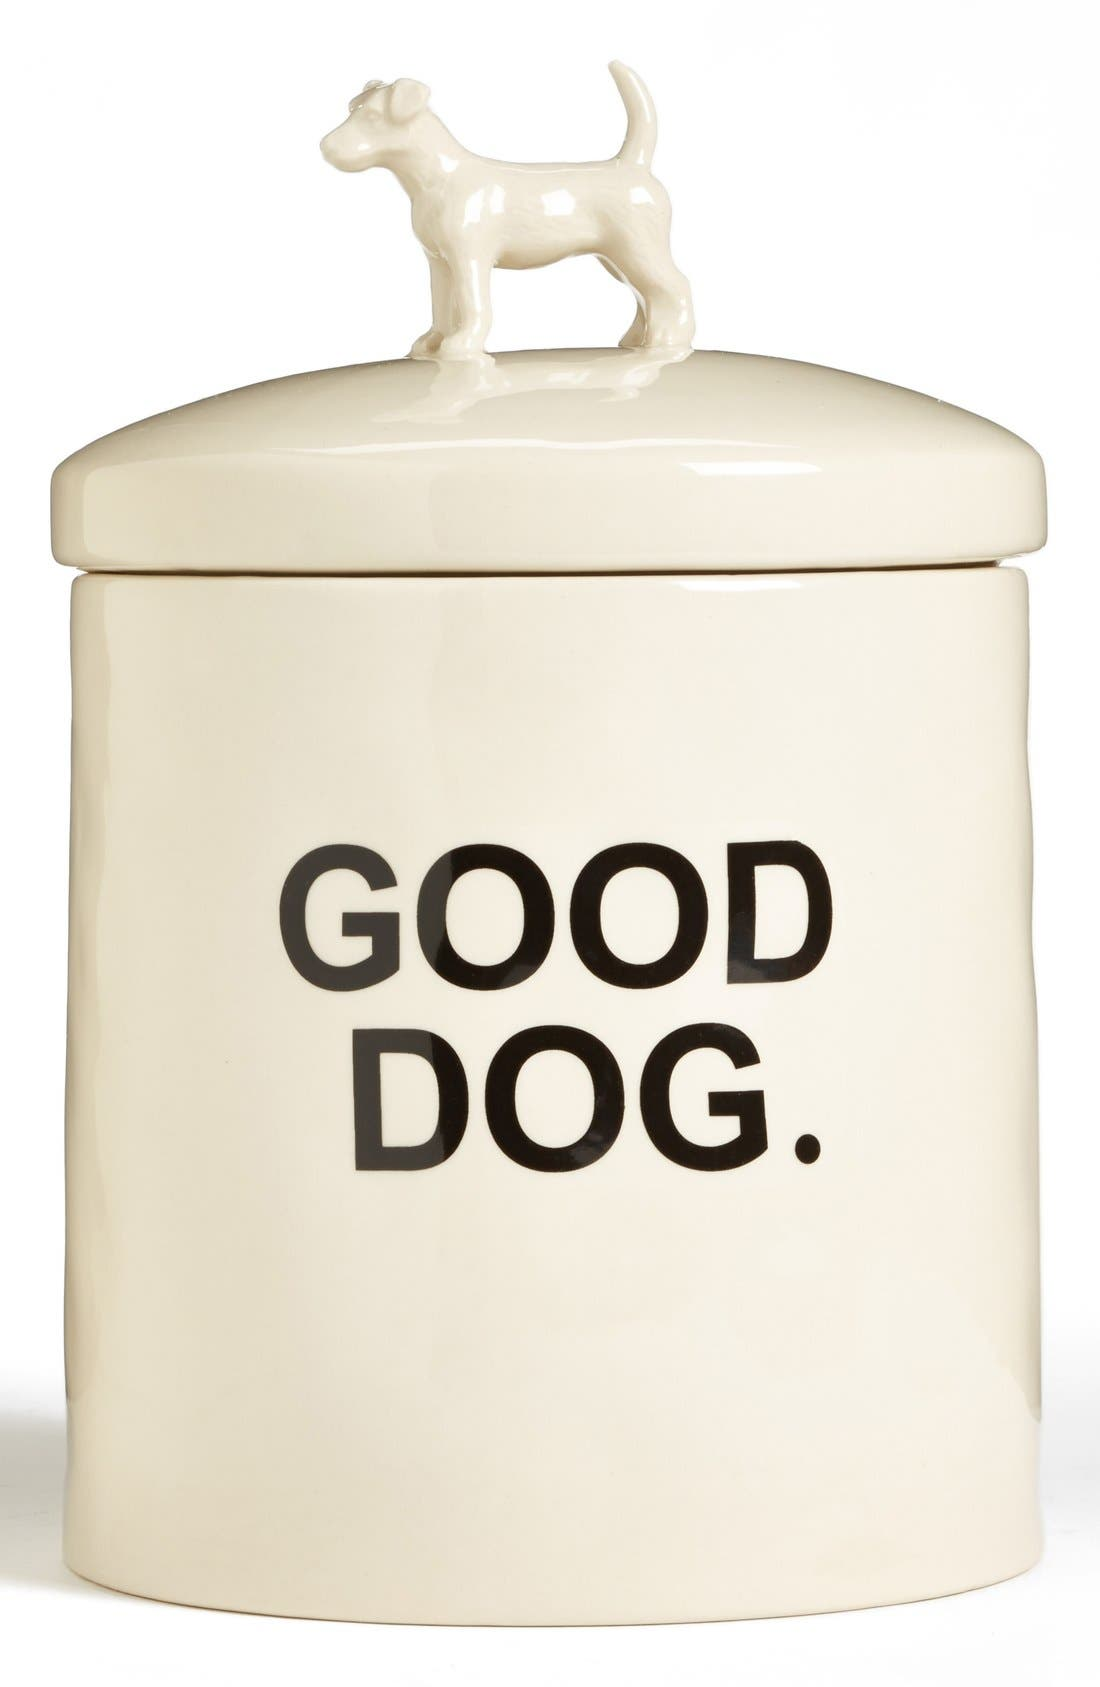 Alternate Image 1 Selected - Rae Dunn 'Wilma' Dog Treat Jar